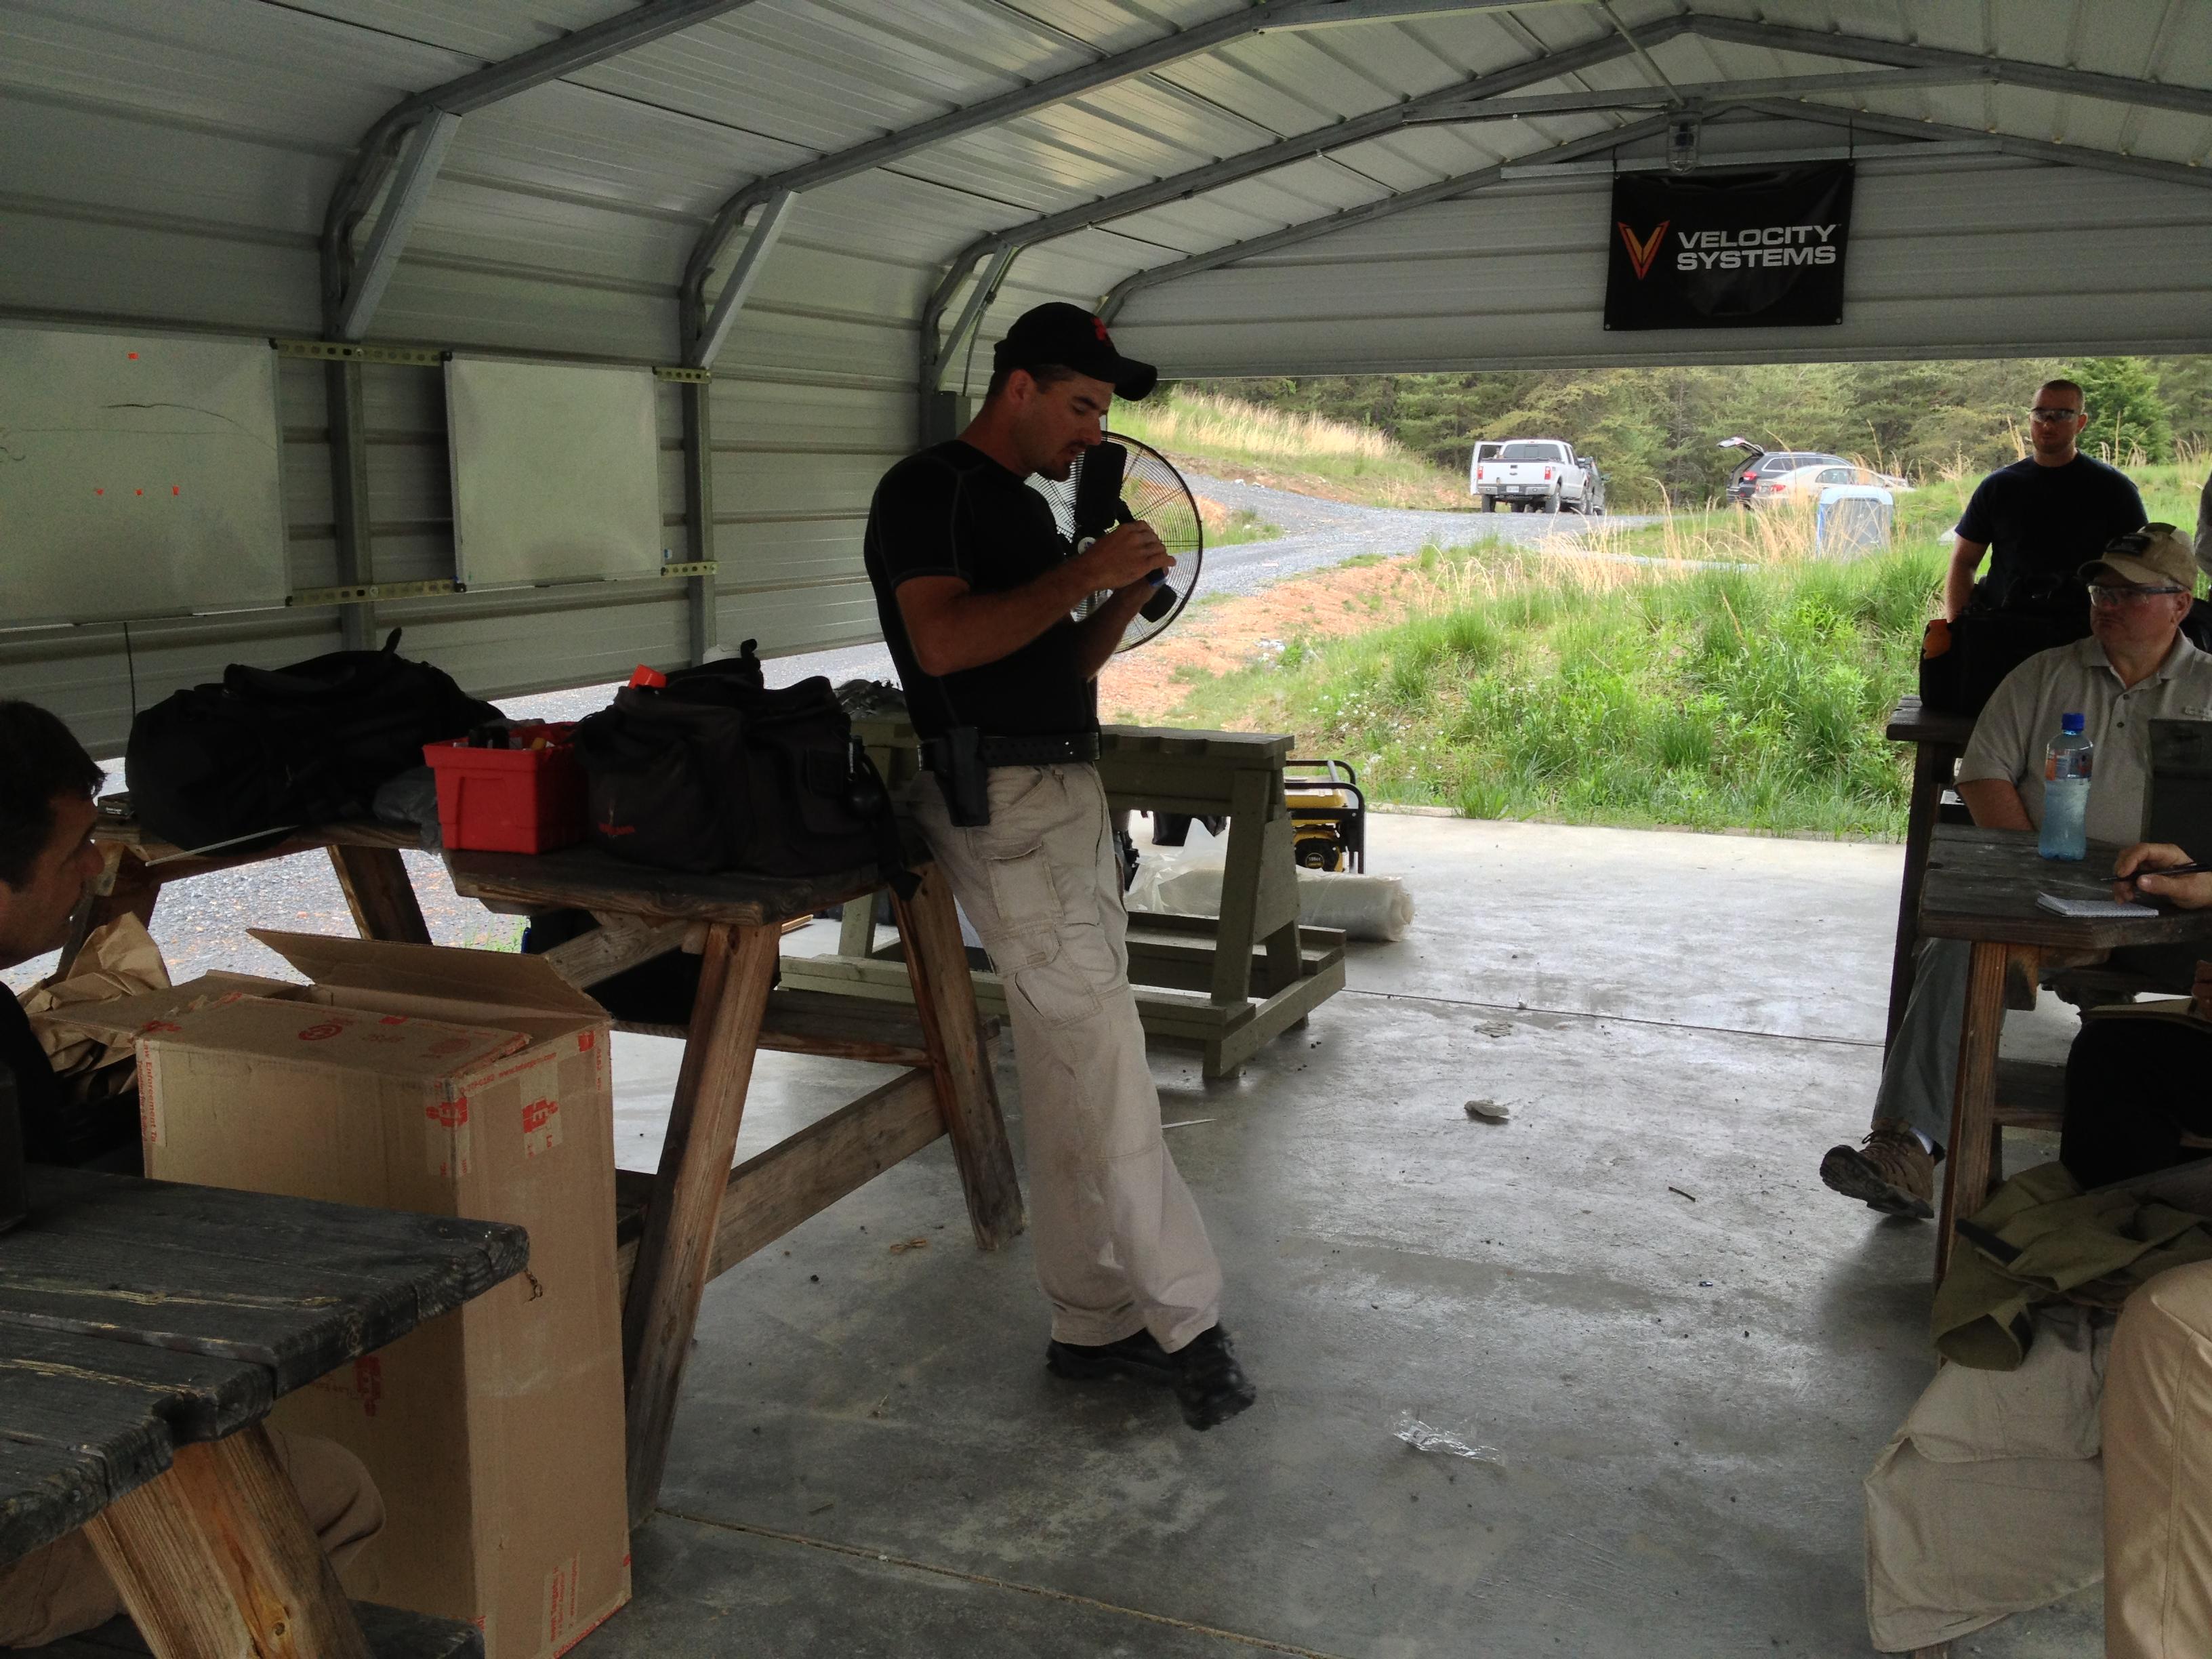 Course Review: Bob Vogel World Class Pistol Skills – Part 2